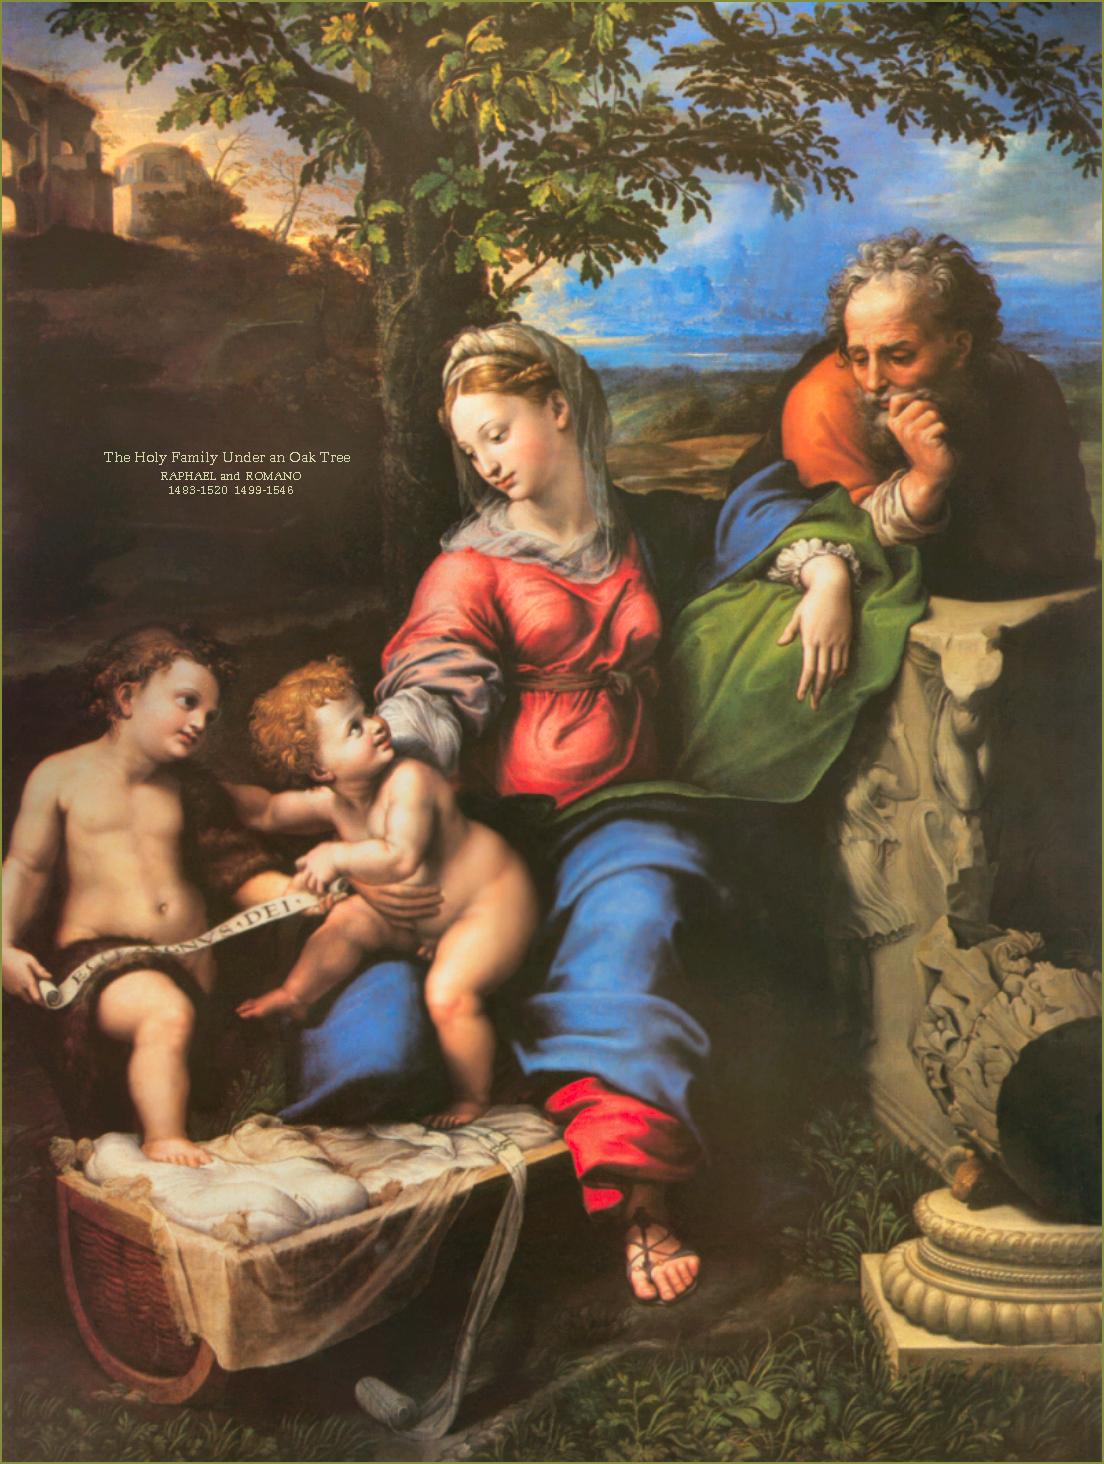 holy-family1 - RAPHAEL AND ROMANO